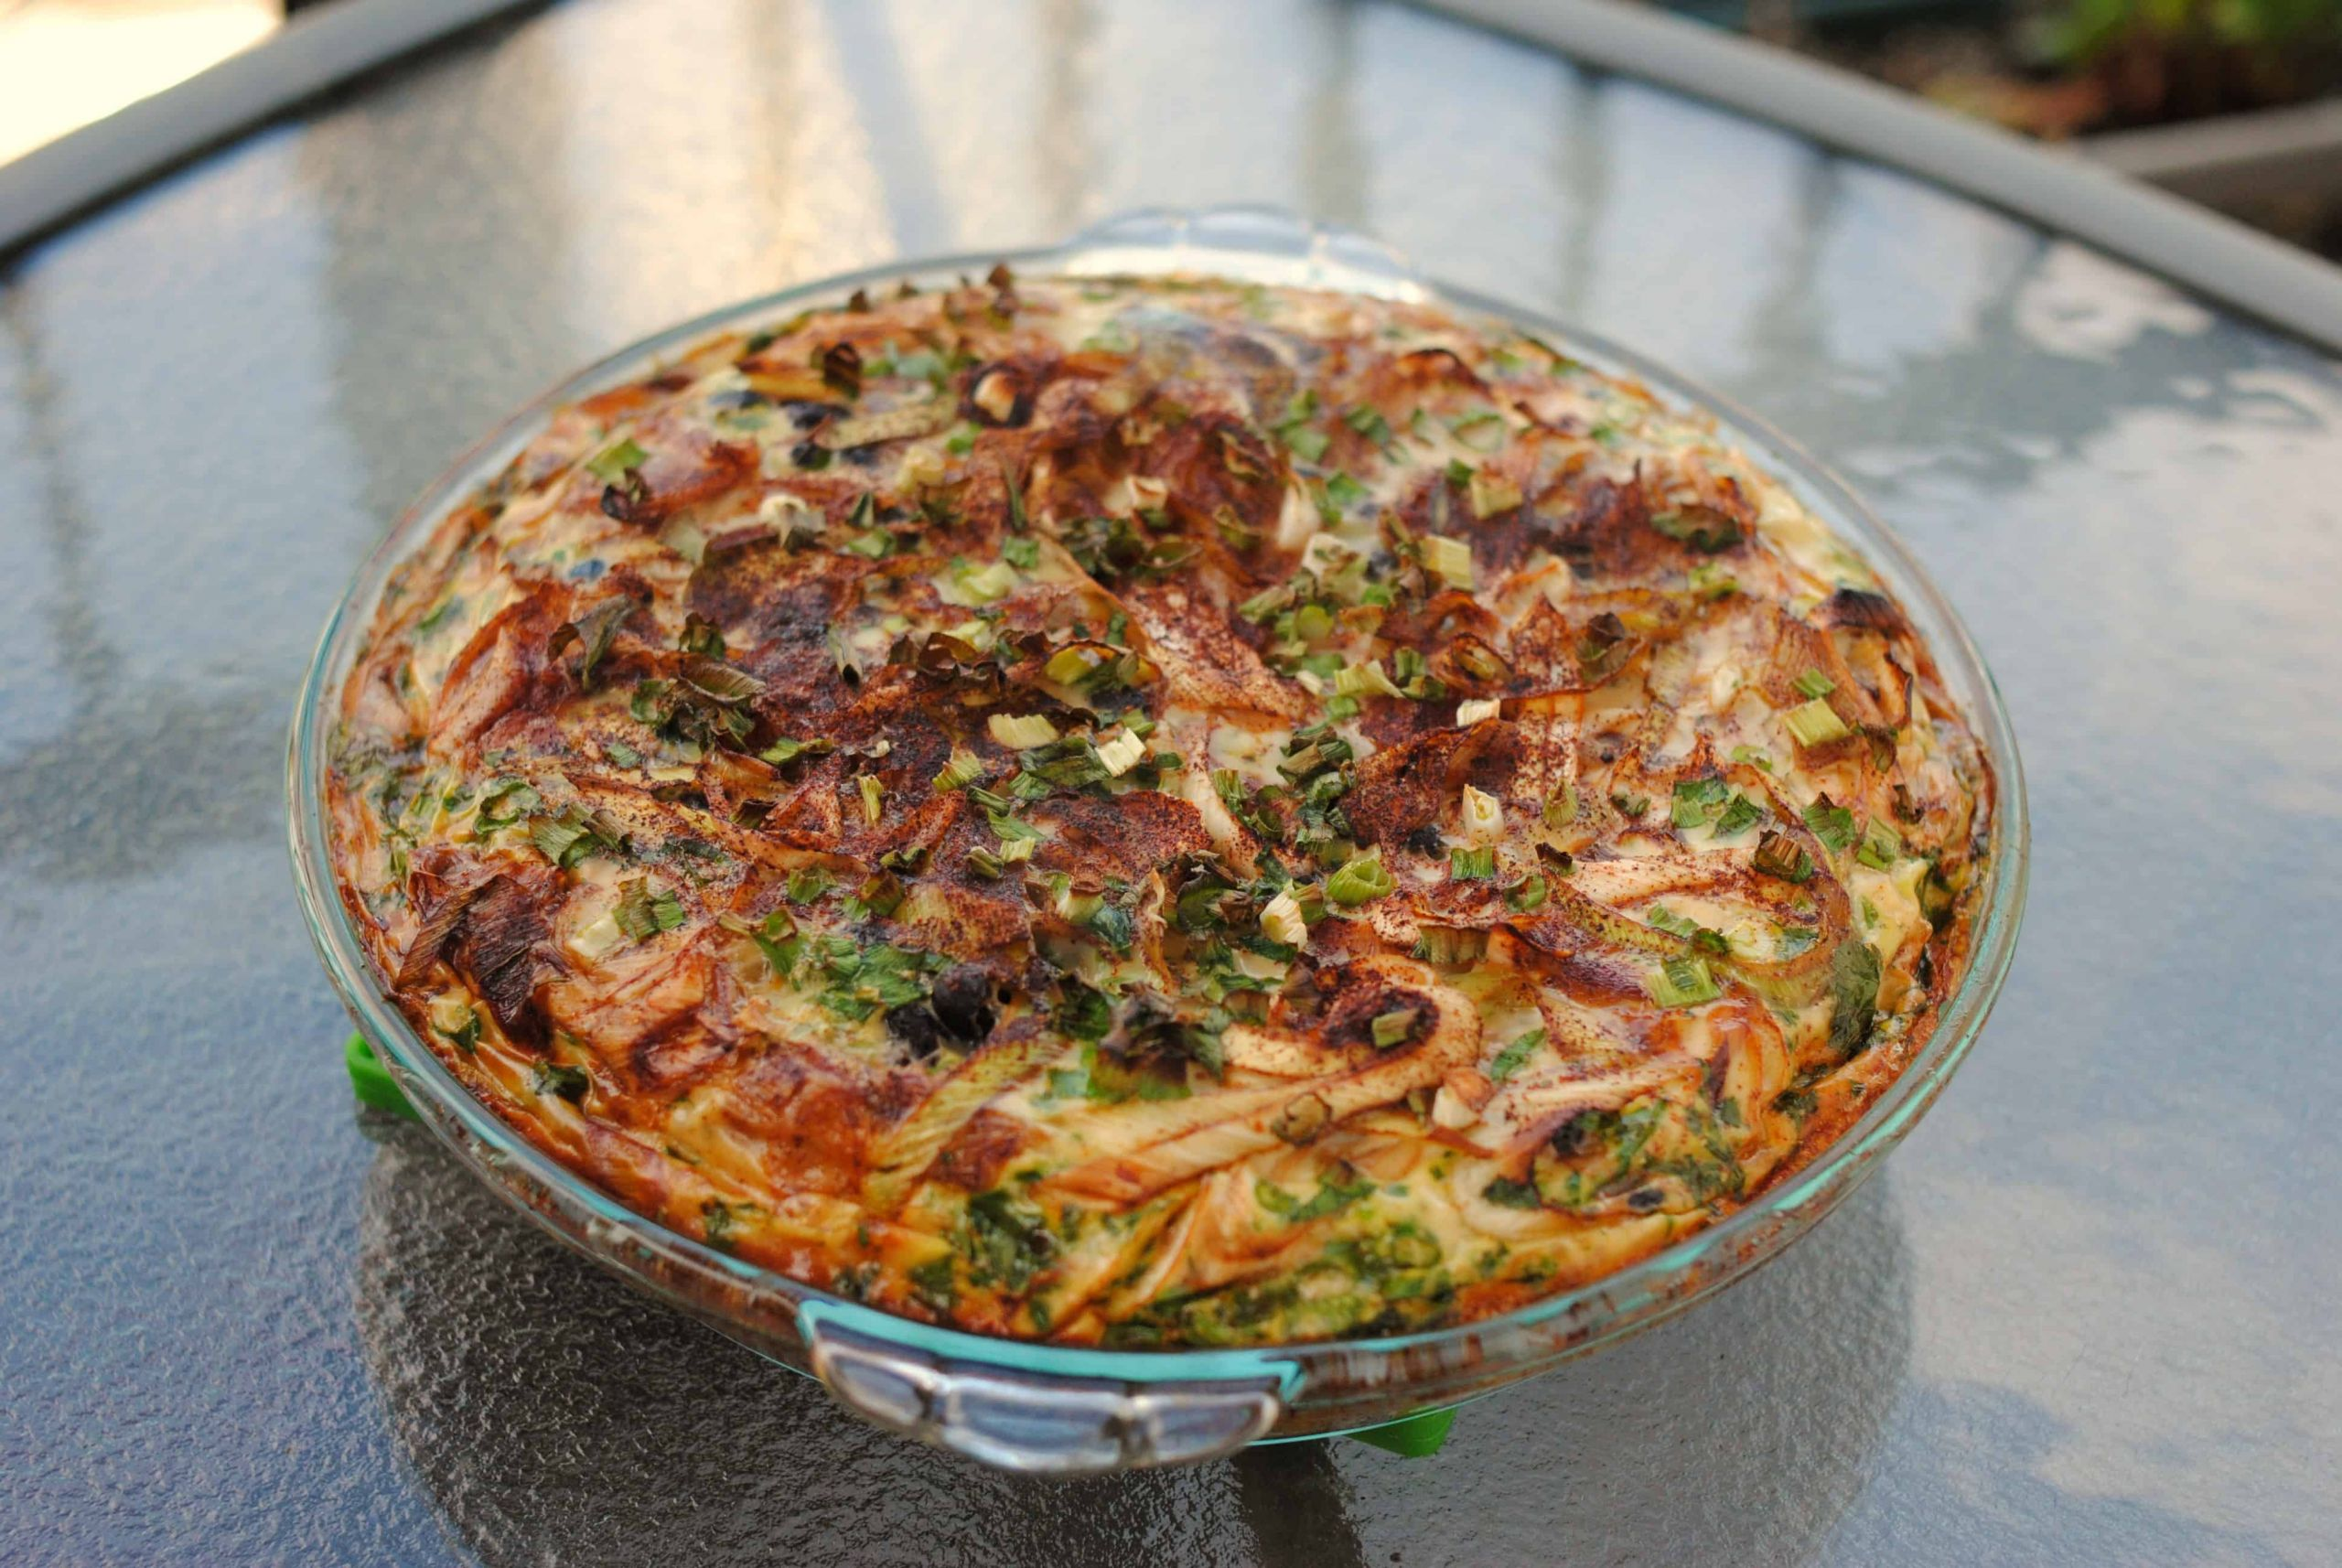 Low Fat Paleo Recipes  Layered Frittata low amine gluten free dairy free yolk